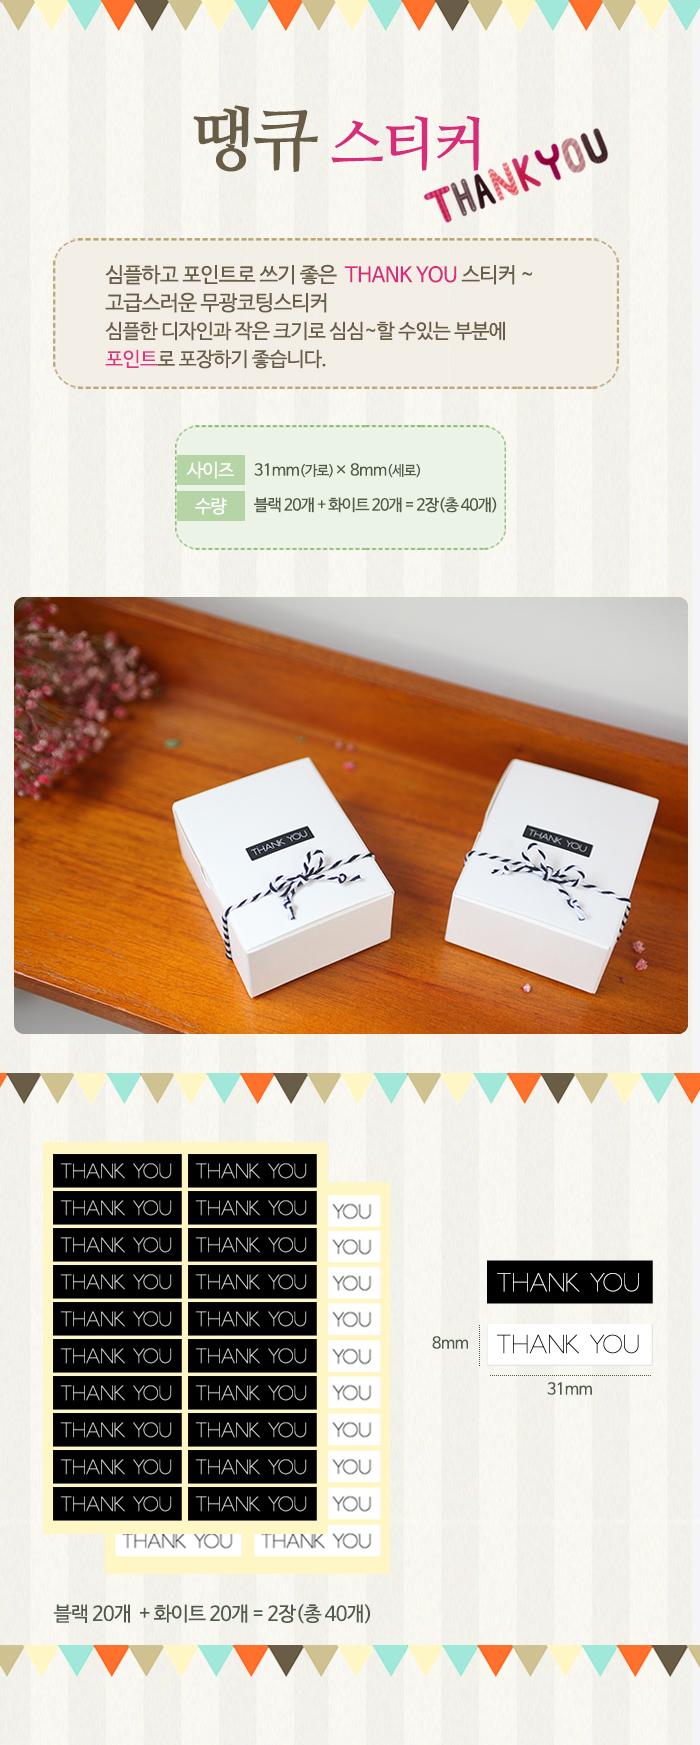 [DIY] 땡큐 스티커 (2색×10줄×2장) - 레드비, 1,000원, 스티커, 문자/숫자 스티커